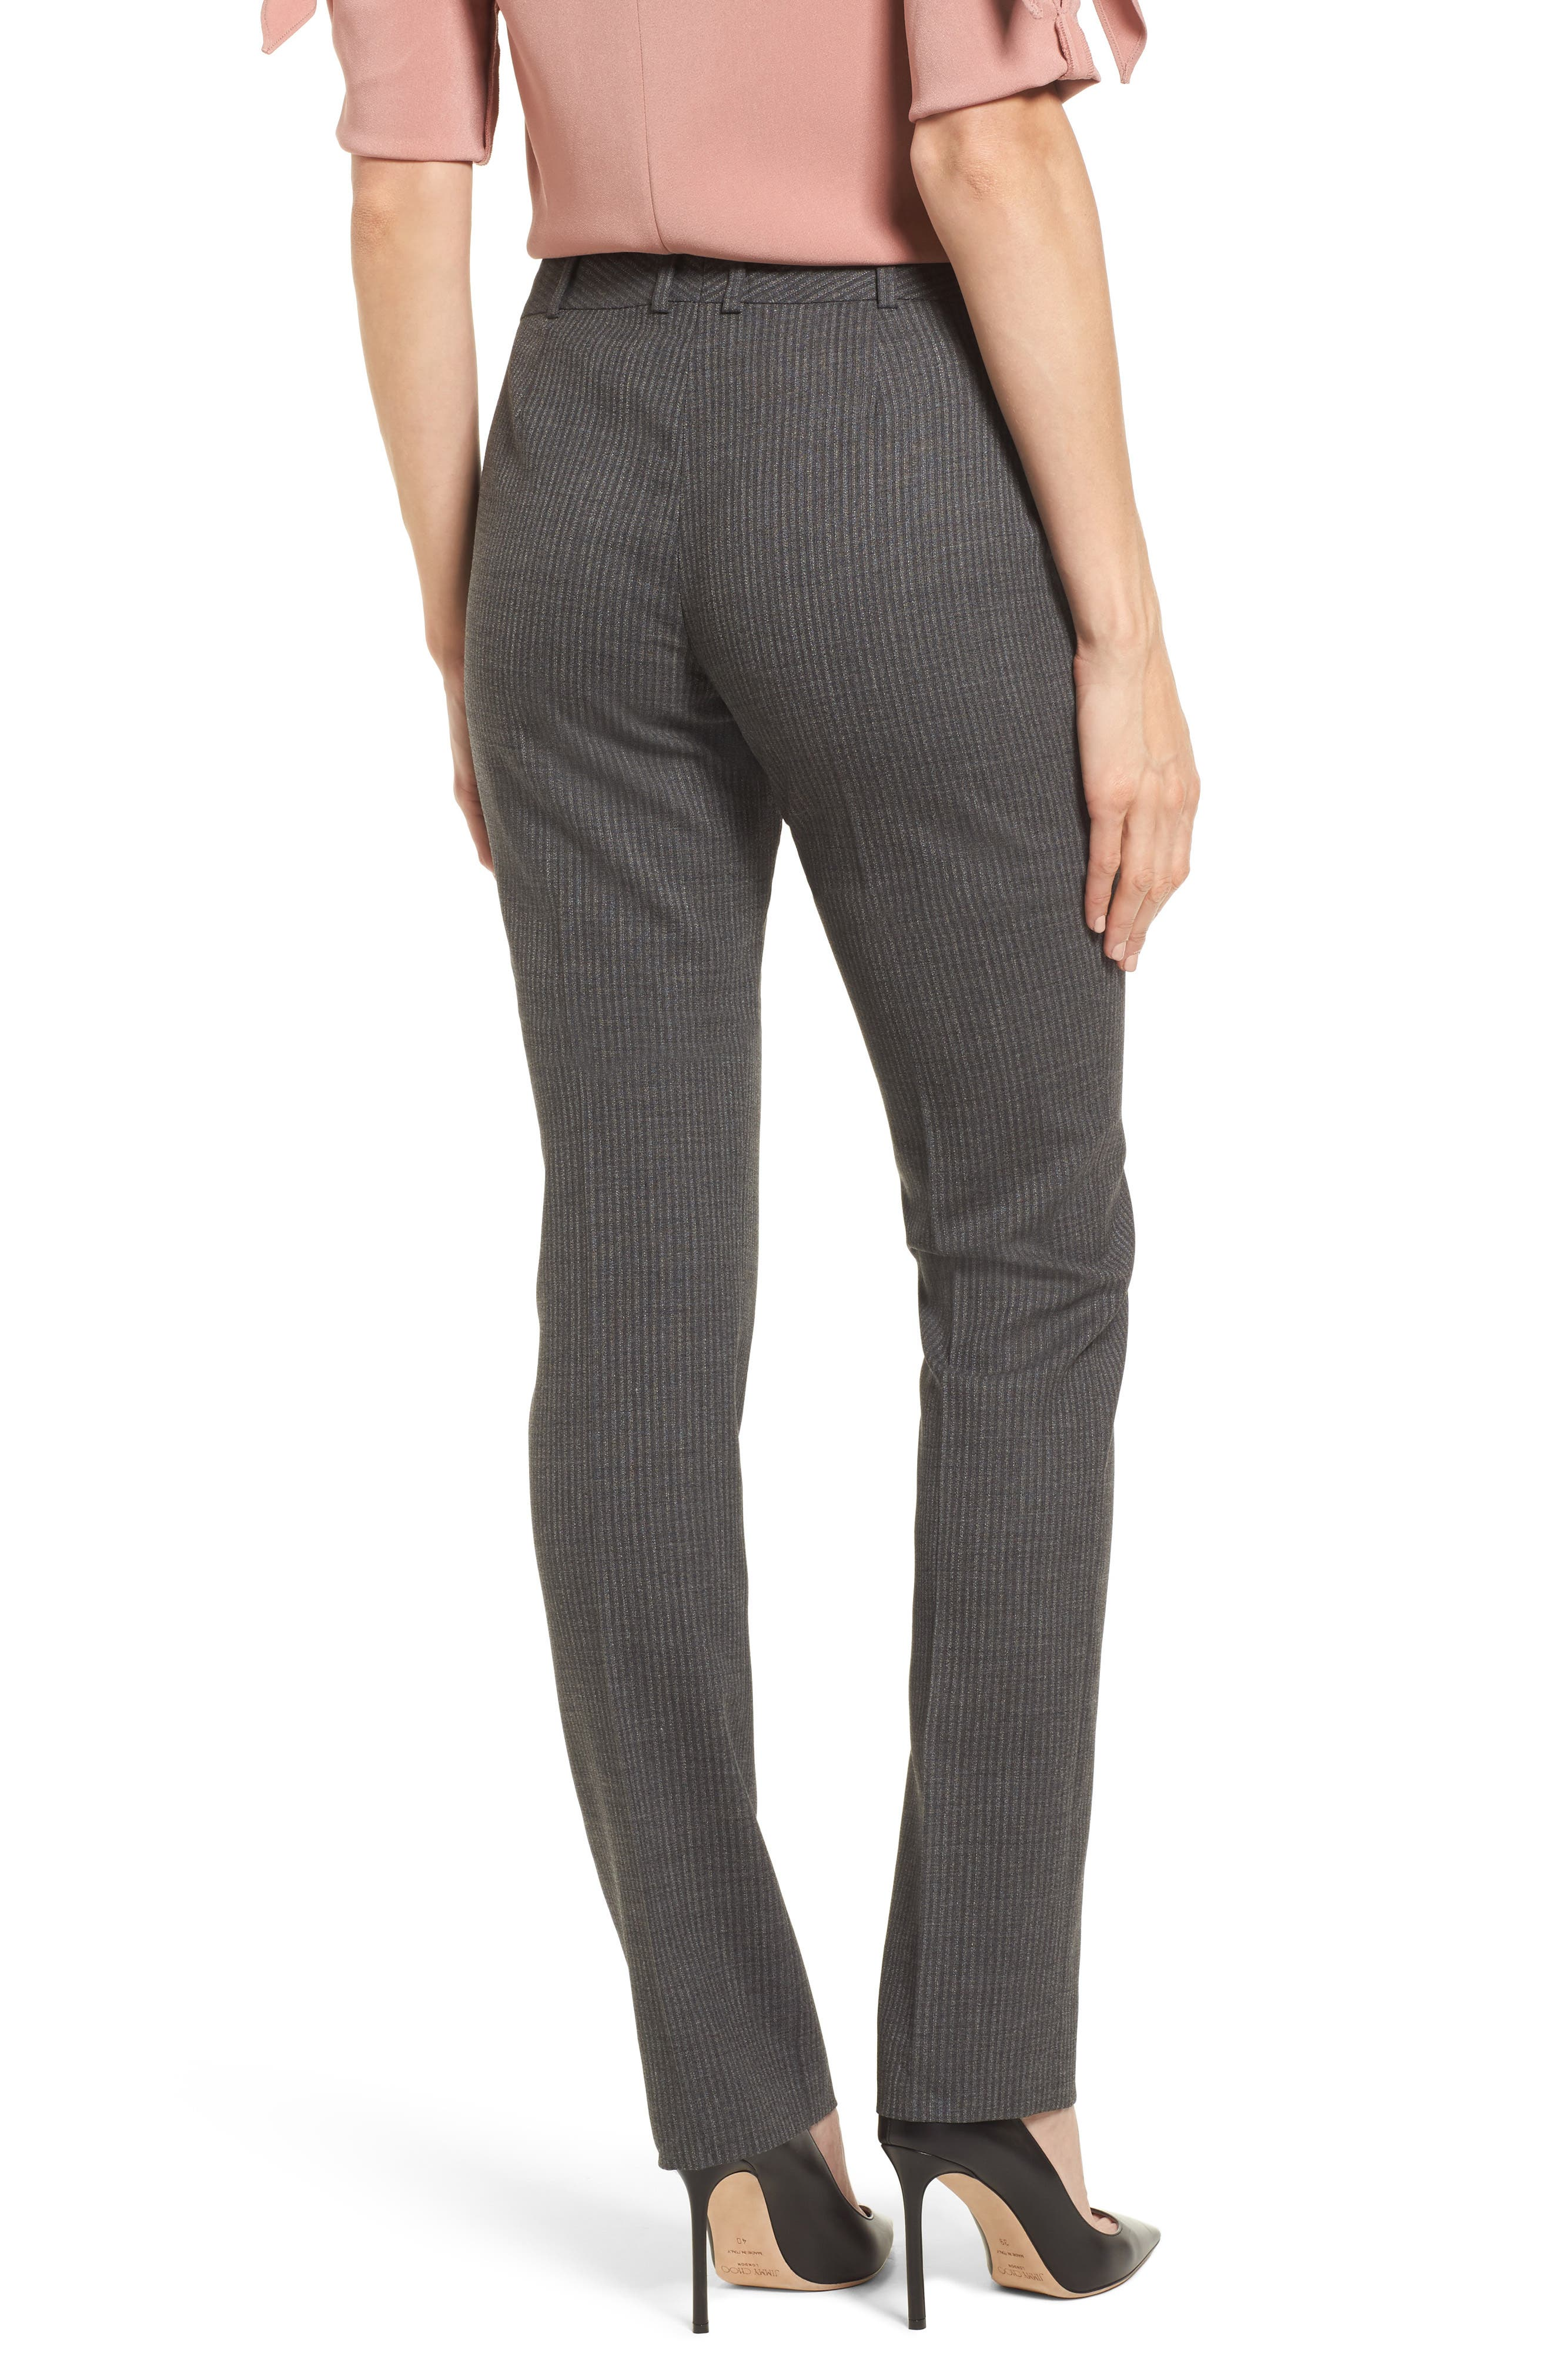 Titana Stretch Wool Trousers,                             Alternate thumbnail 2, color,                             Dark Grey Fantasy